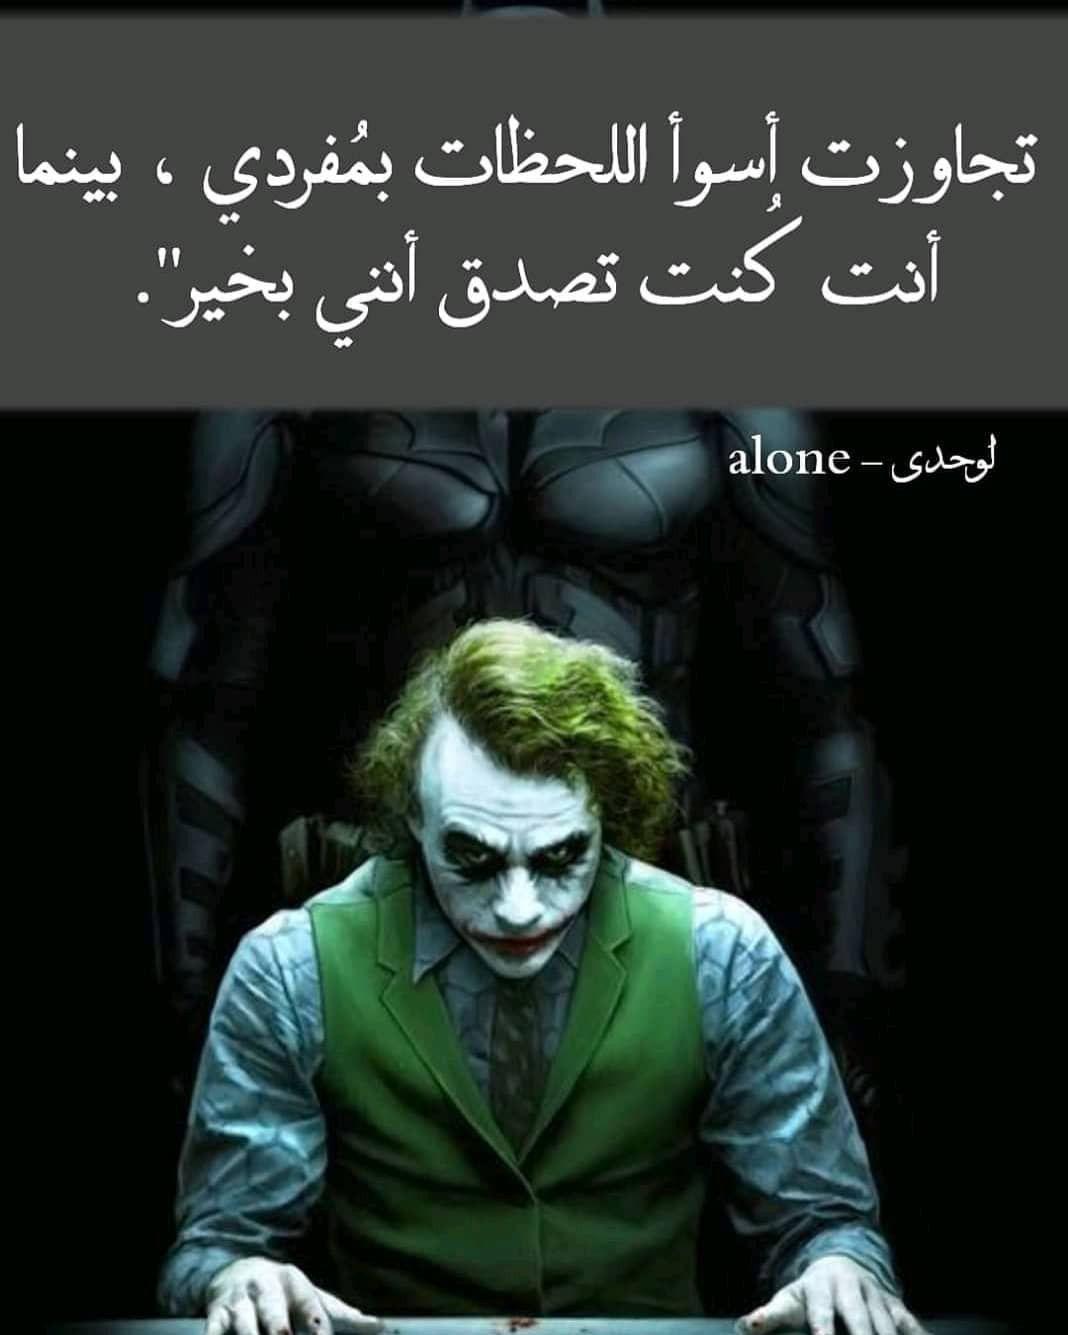 اقوال الجوكر Joker Quotes Beautiful Arabic Words Funny Arabic Quotes